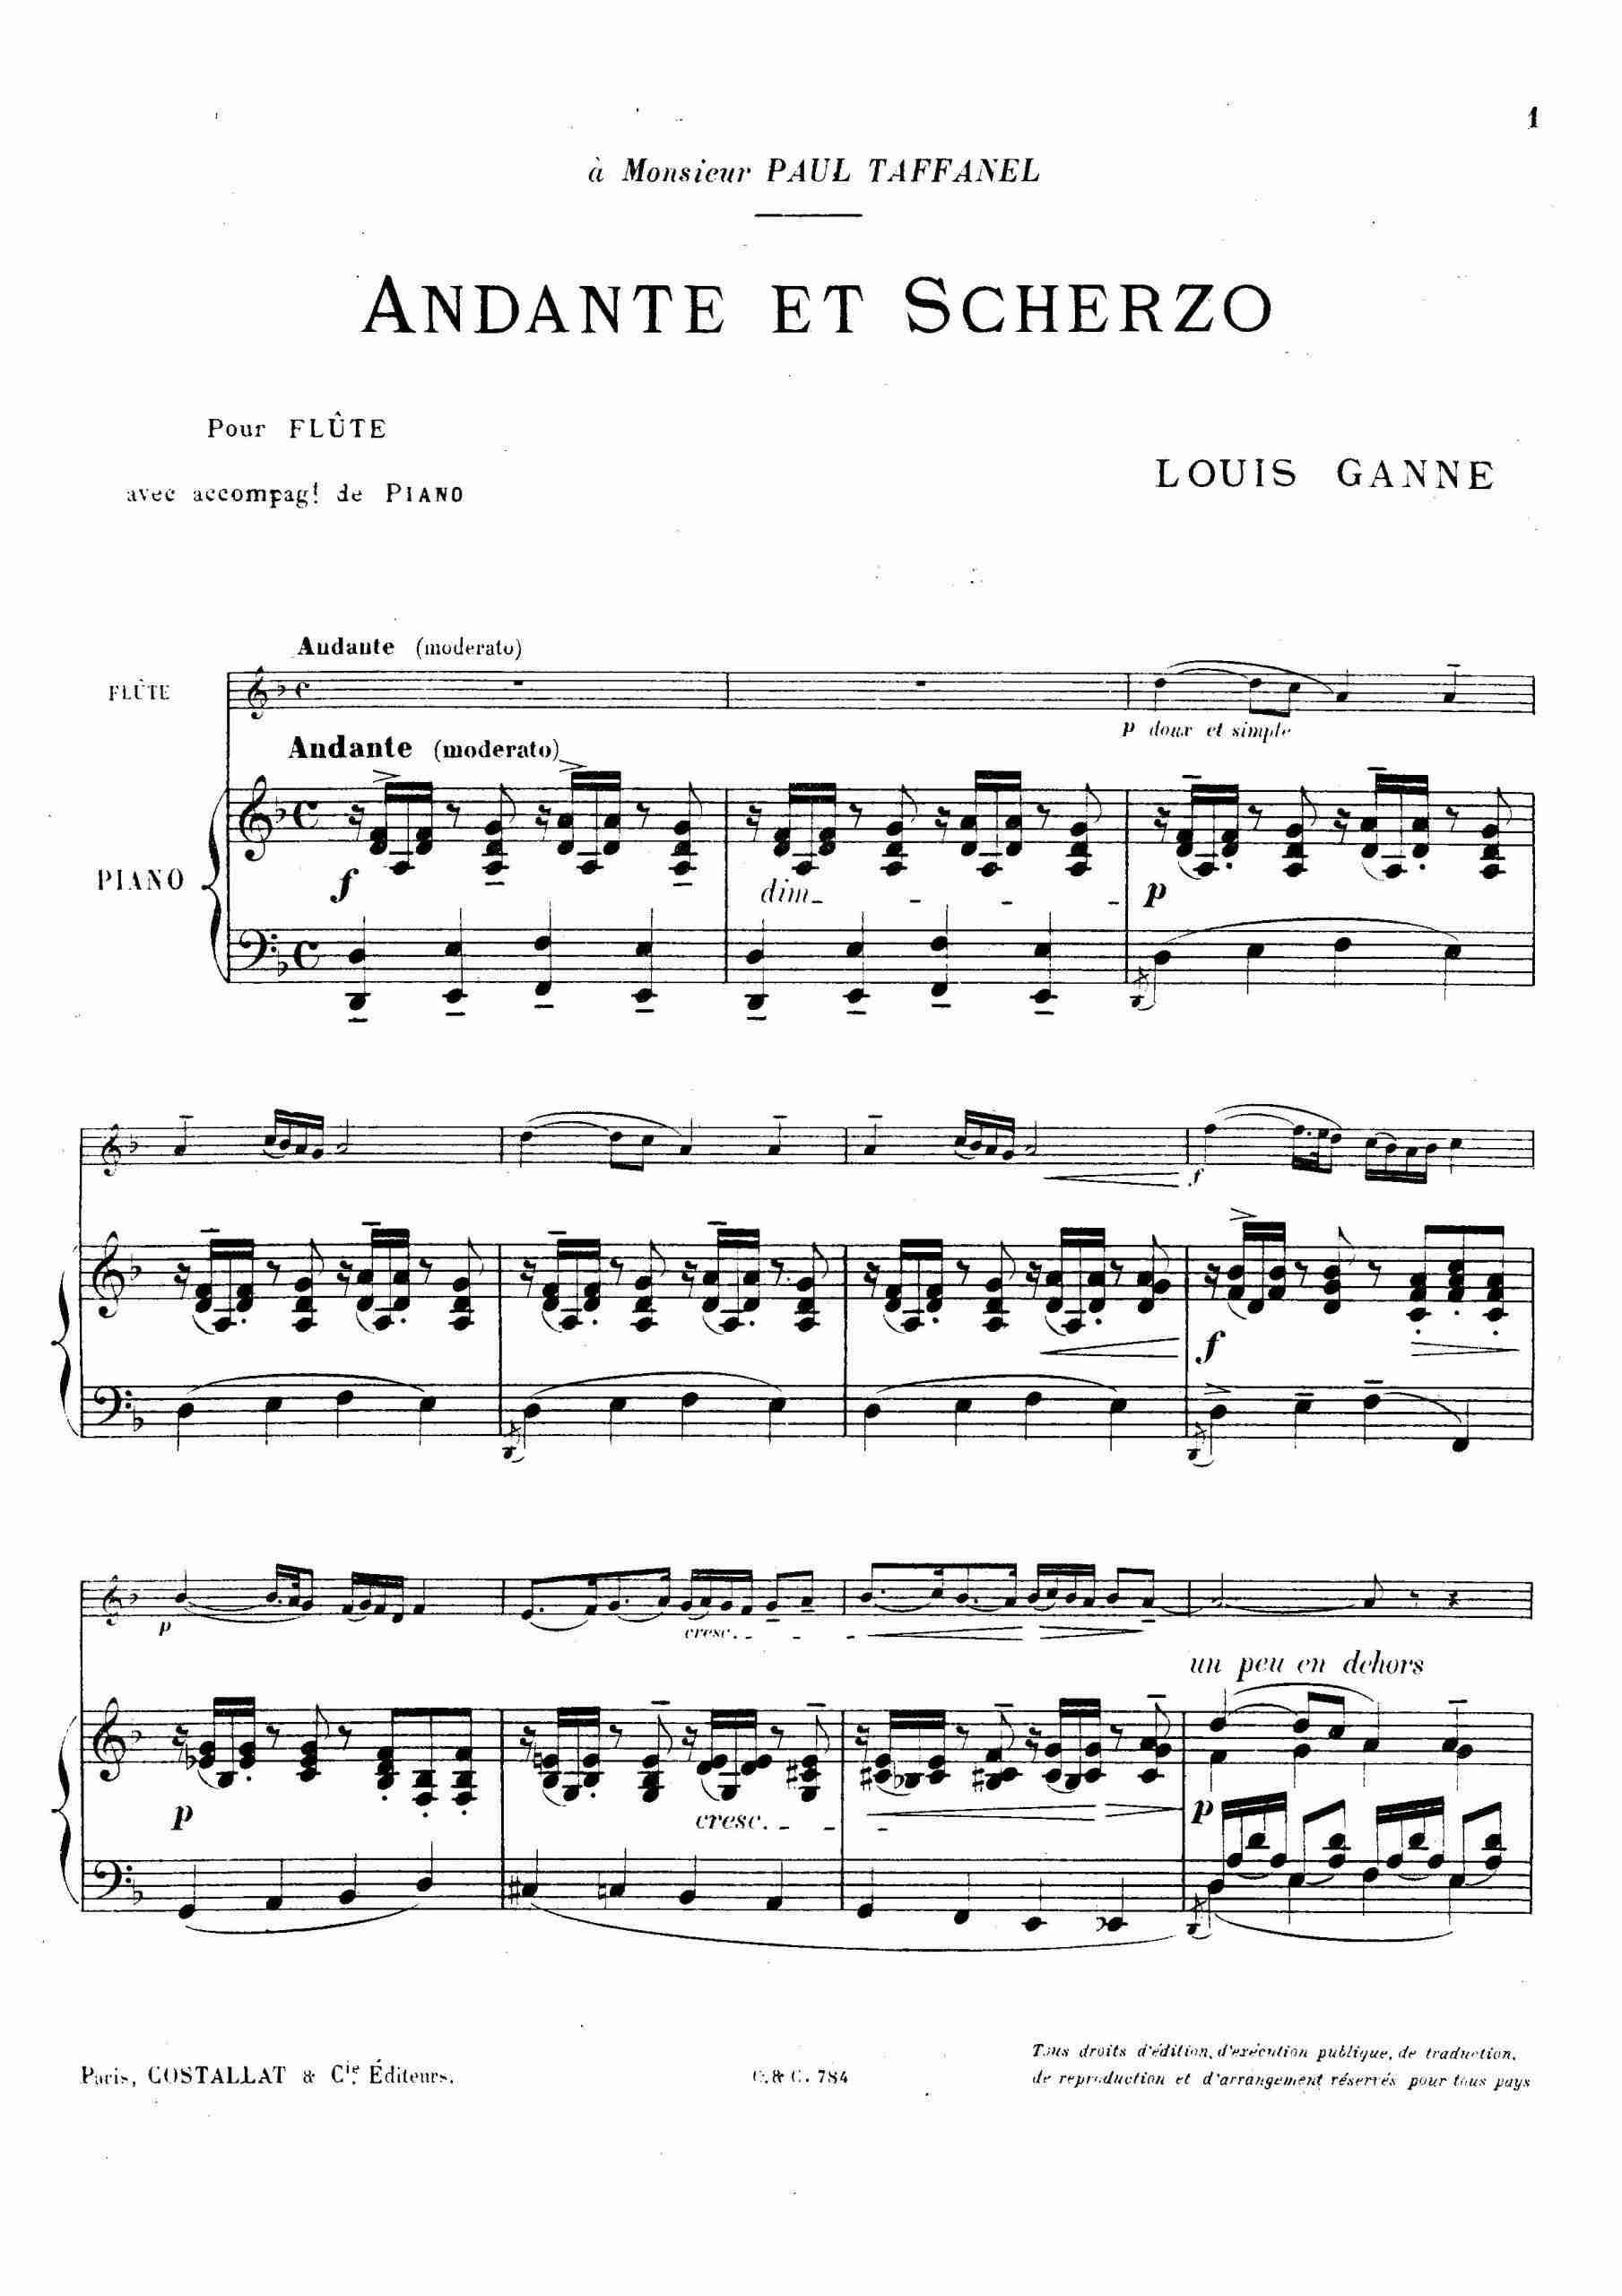 Ganne, Louis - Andante et Scherzo (pno)